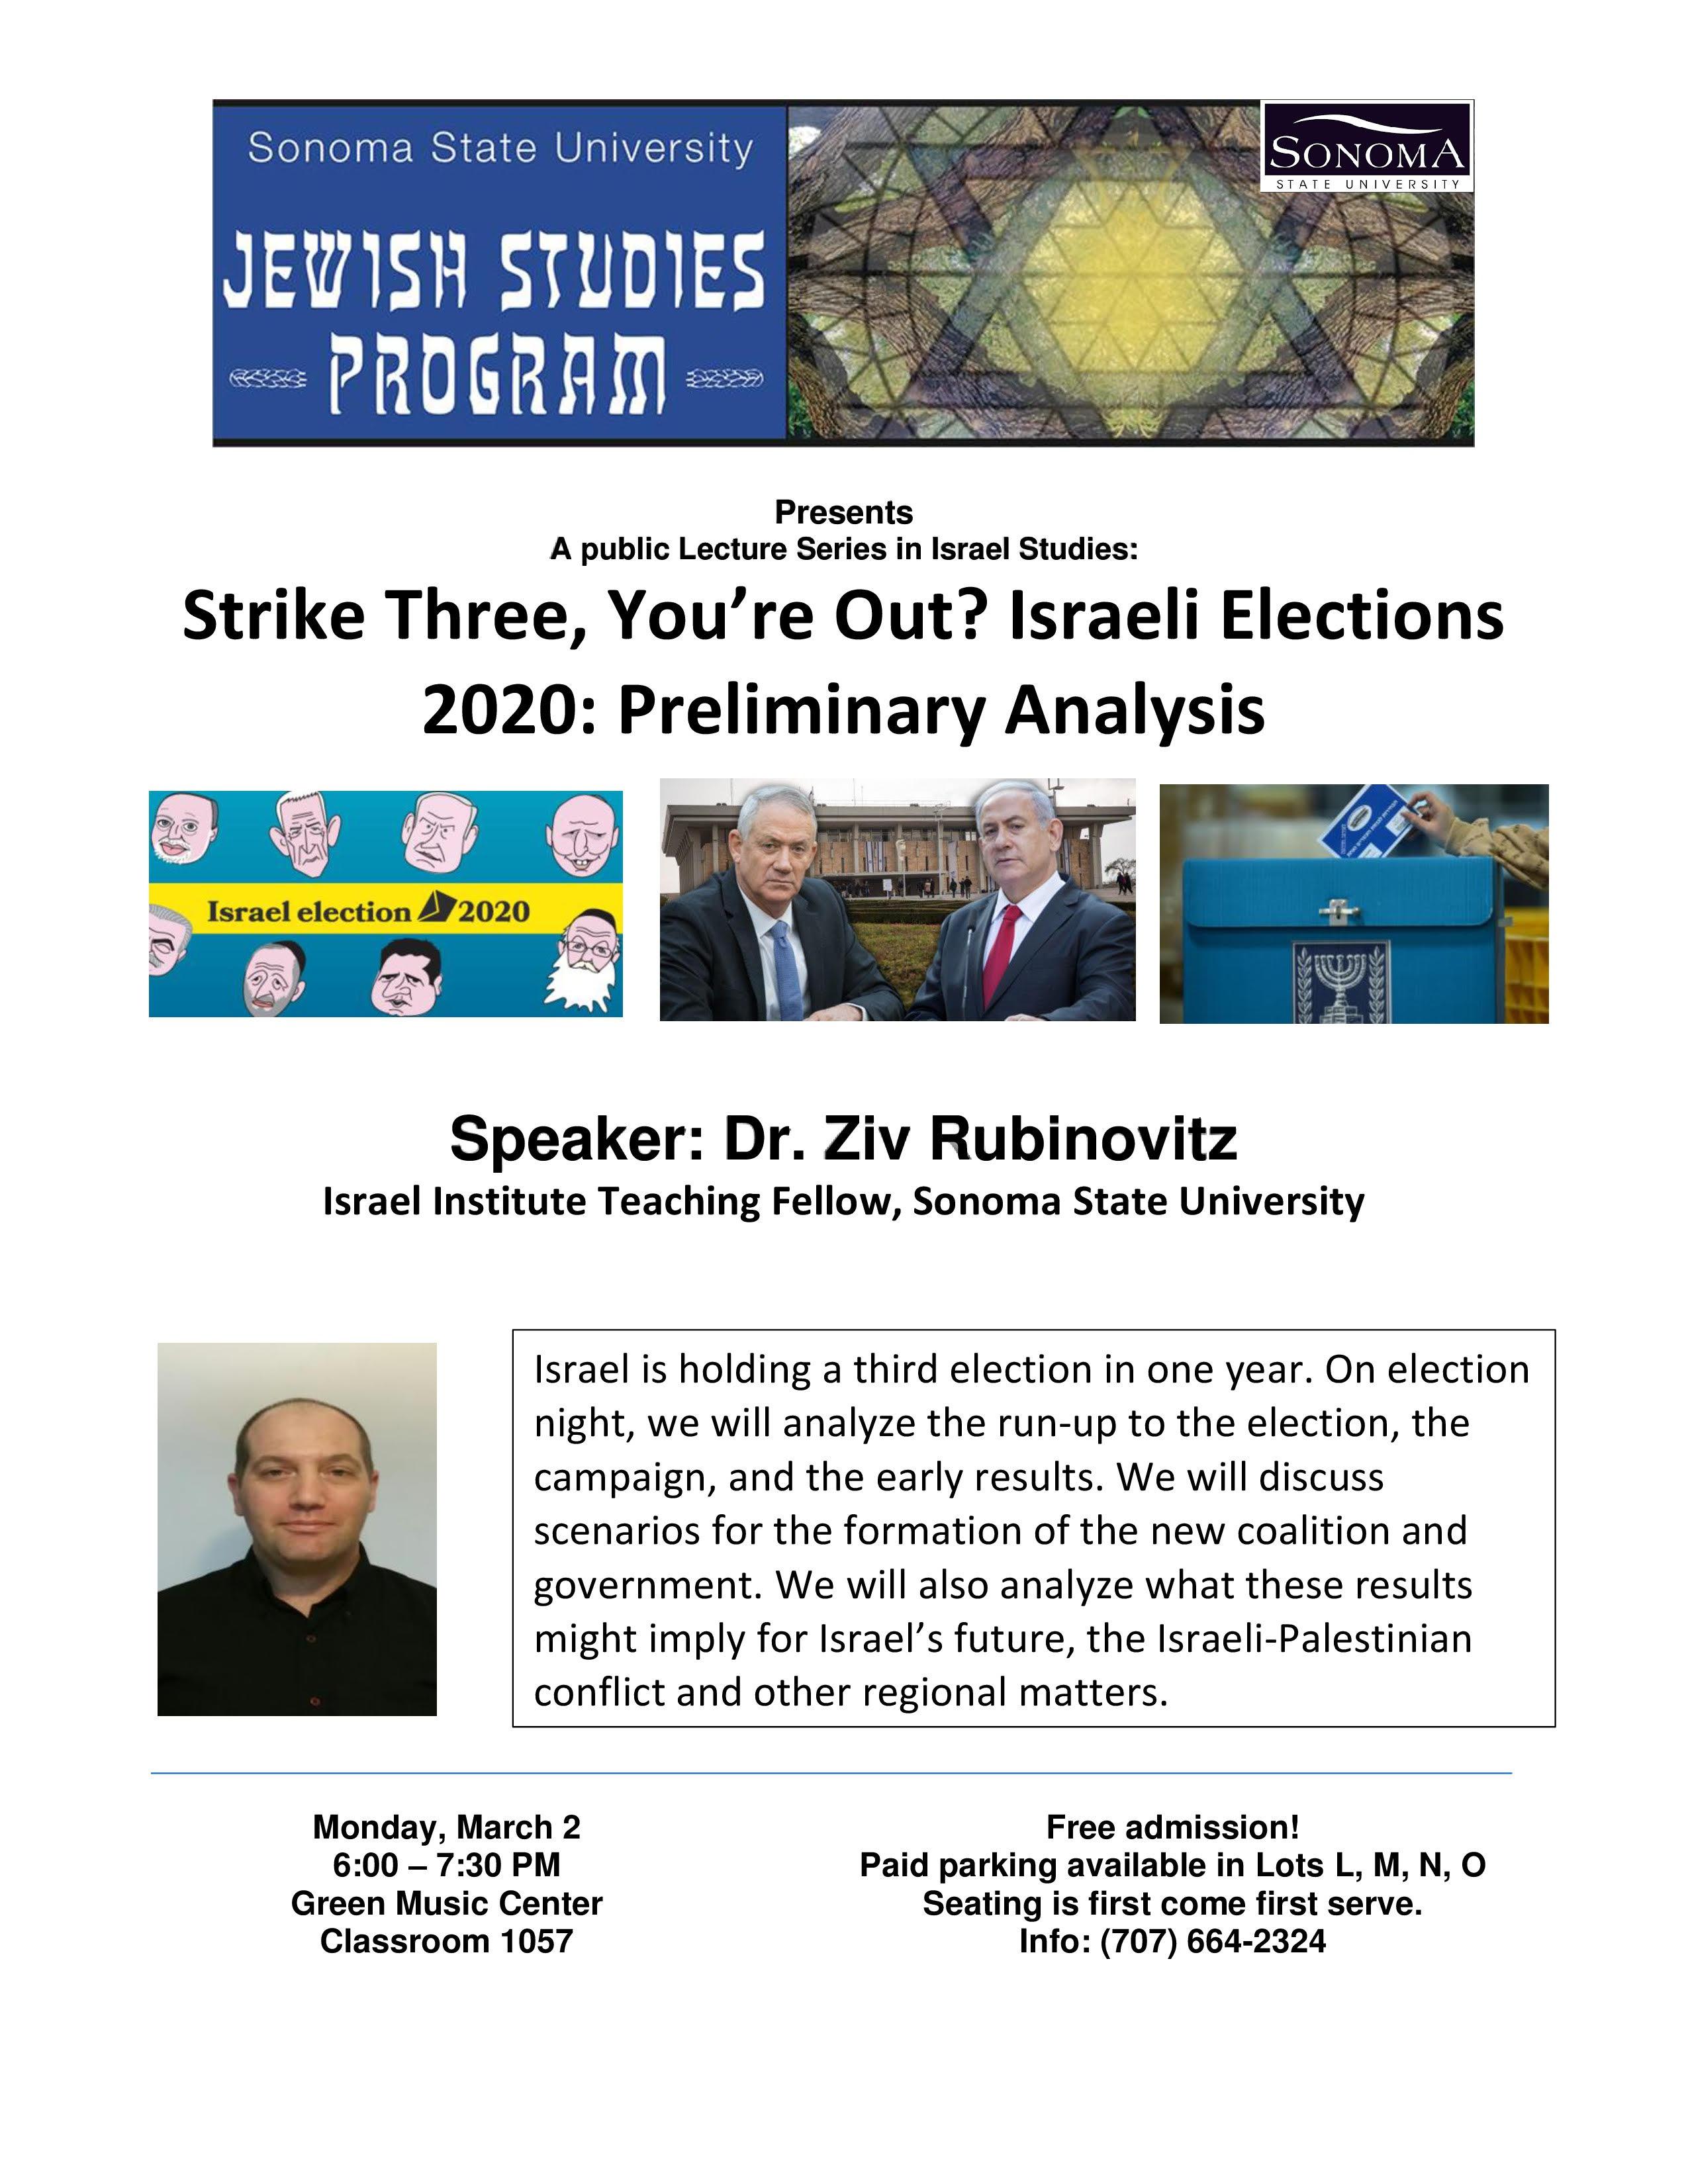 Jewish Studies Program event poster